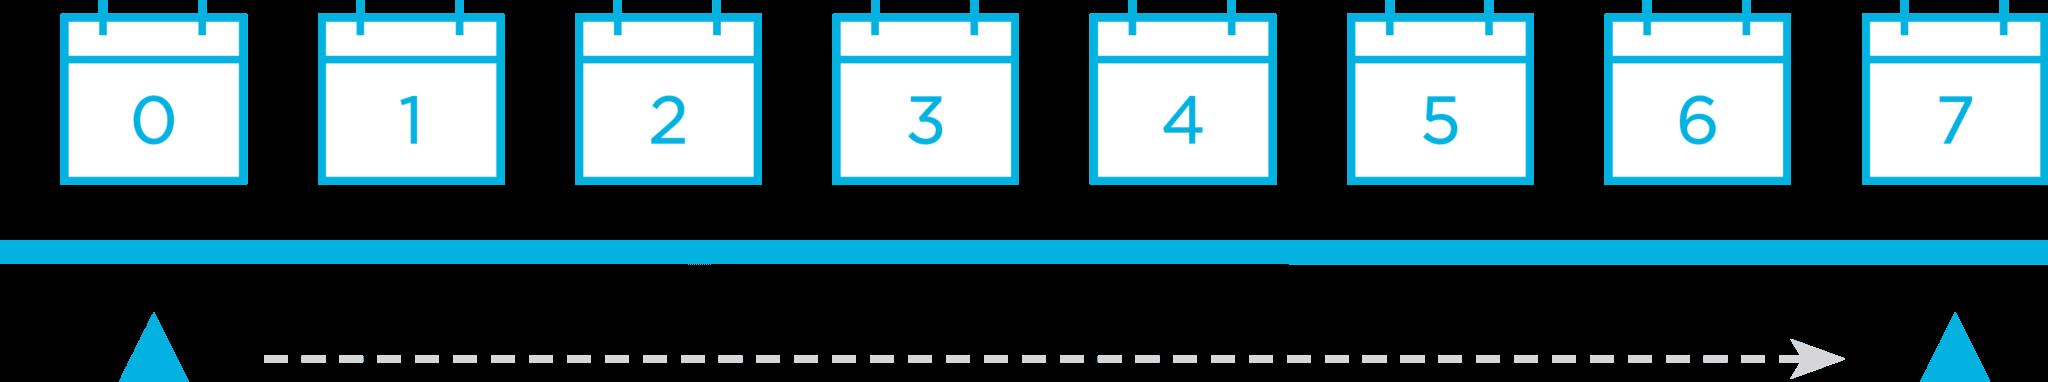 Kochava flexible, configurable measurement window